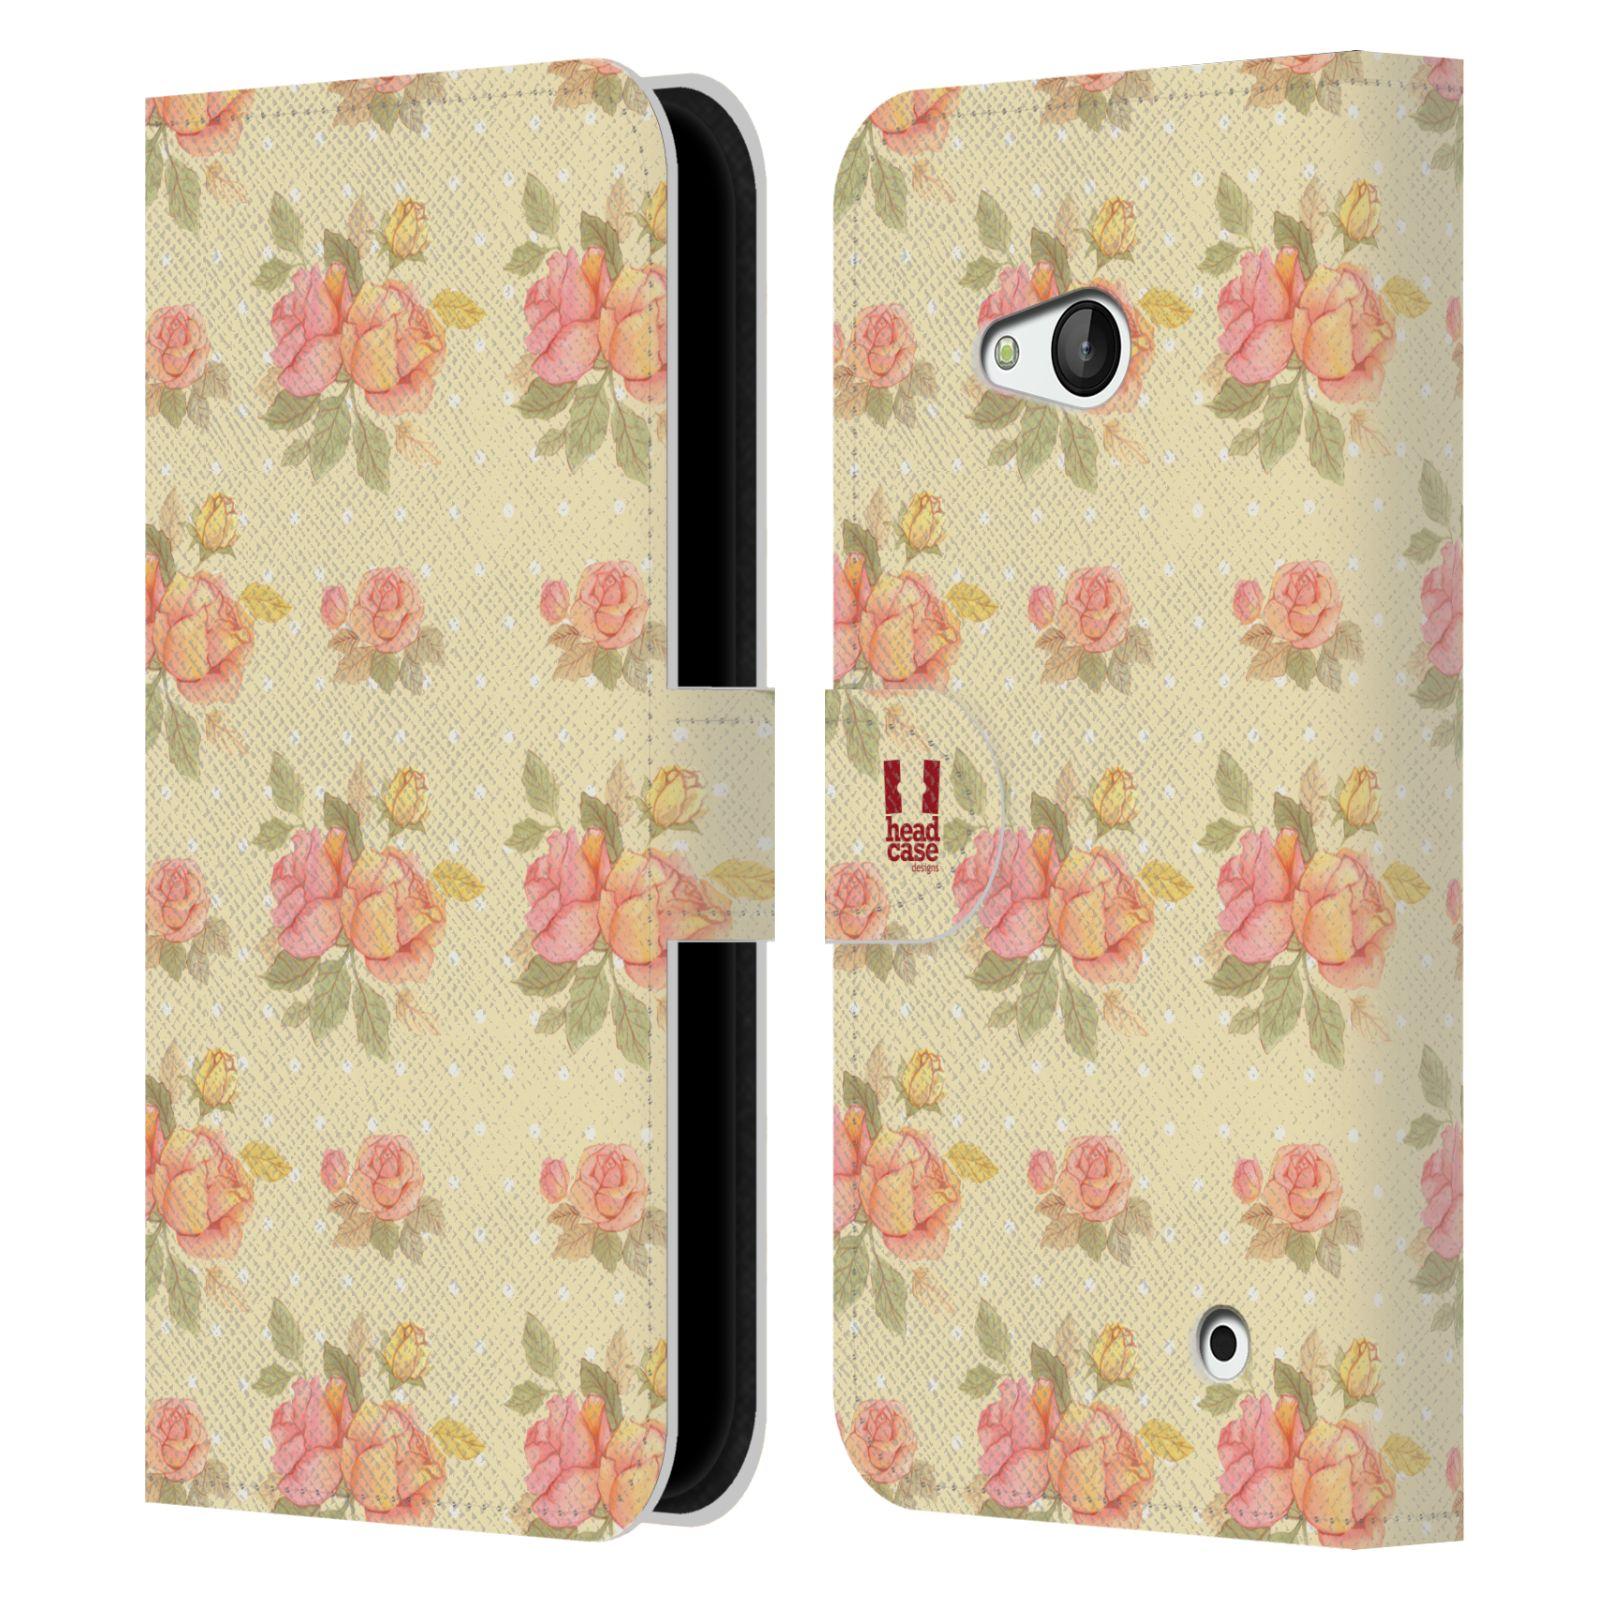 HEAD CASE Flipové pouzdro pro mobil NOKIA / MICROSOFT LUMIA 640 / LUMIA 640 DUAL romantické květy LÉTO